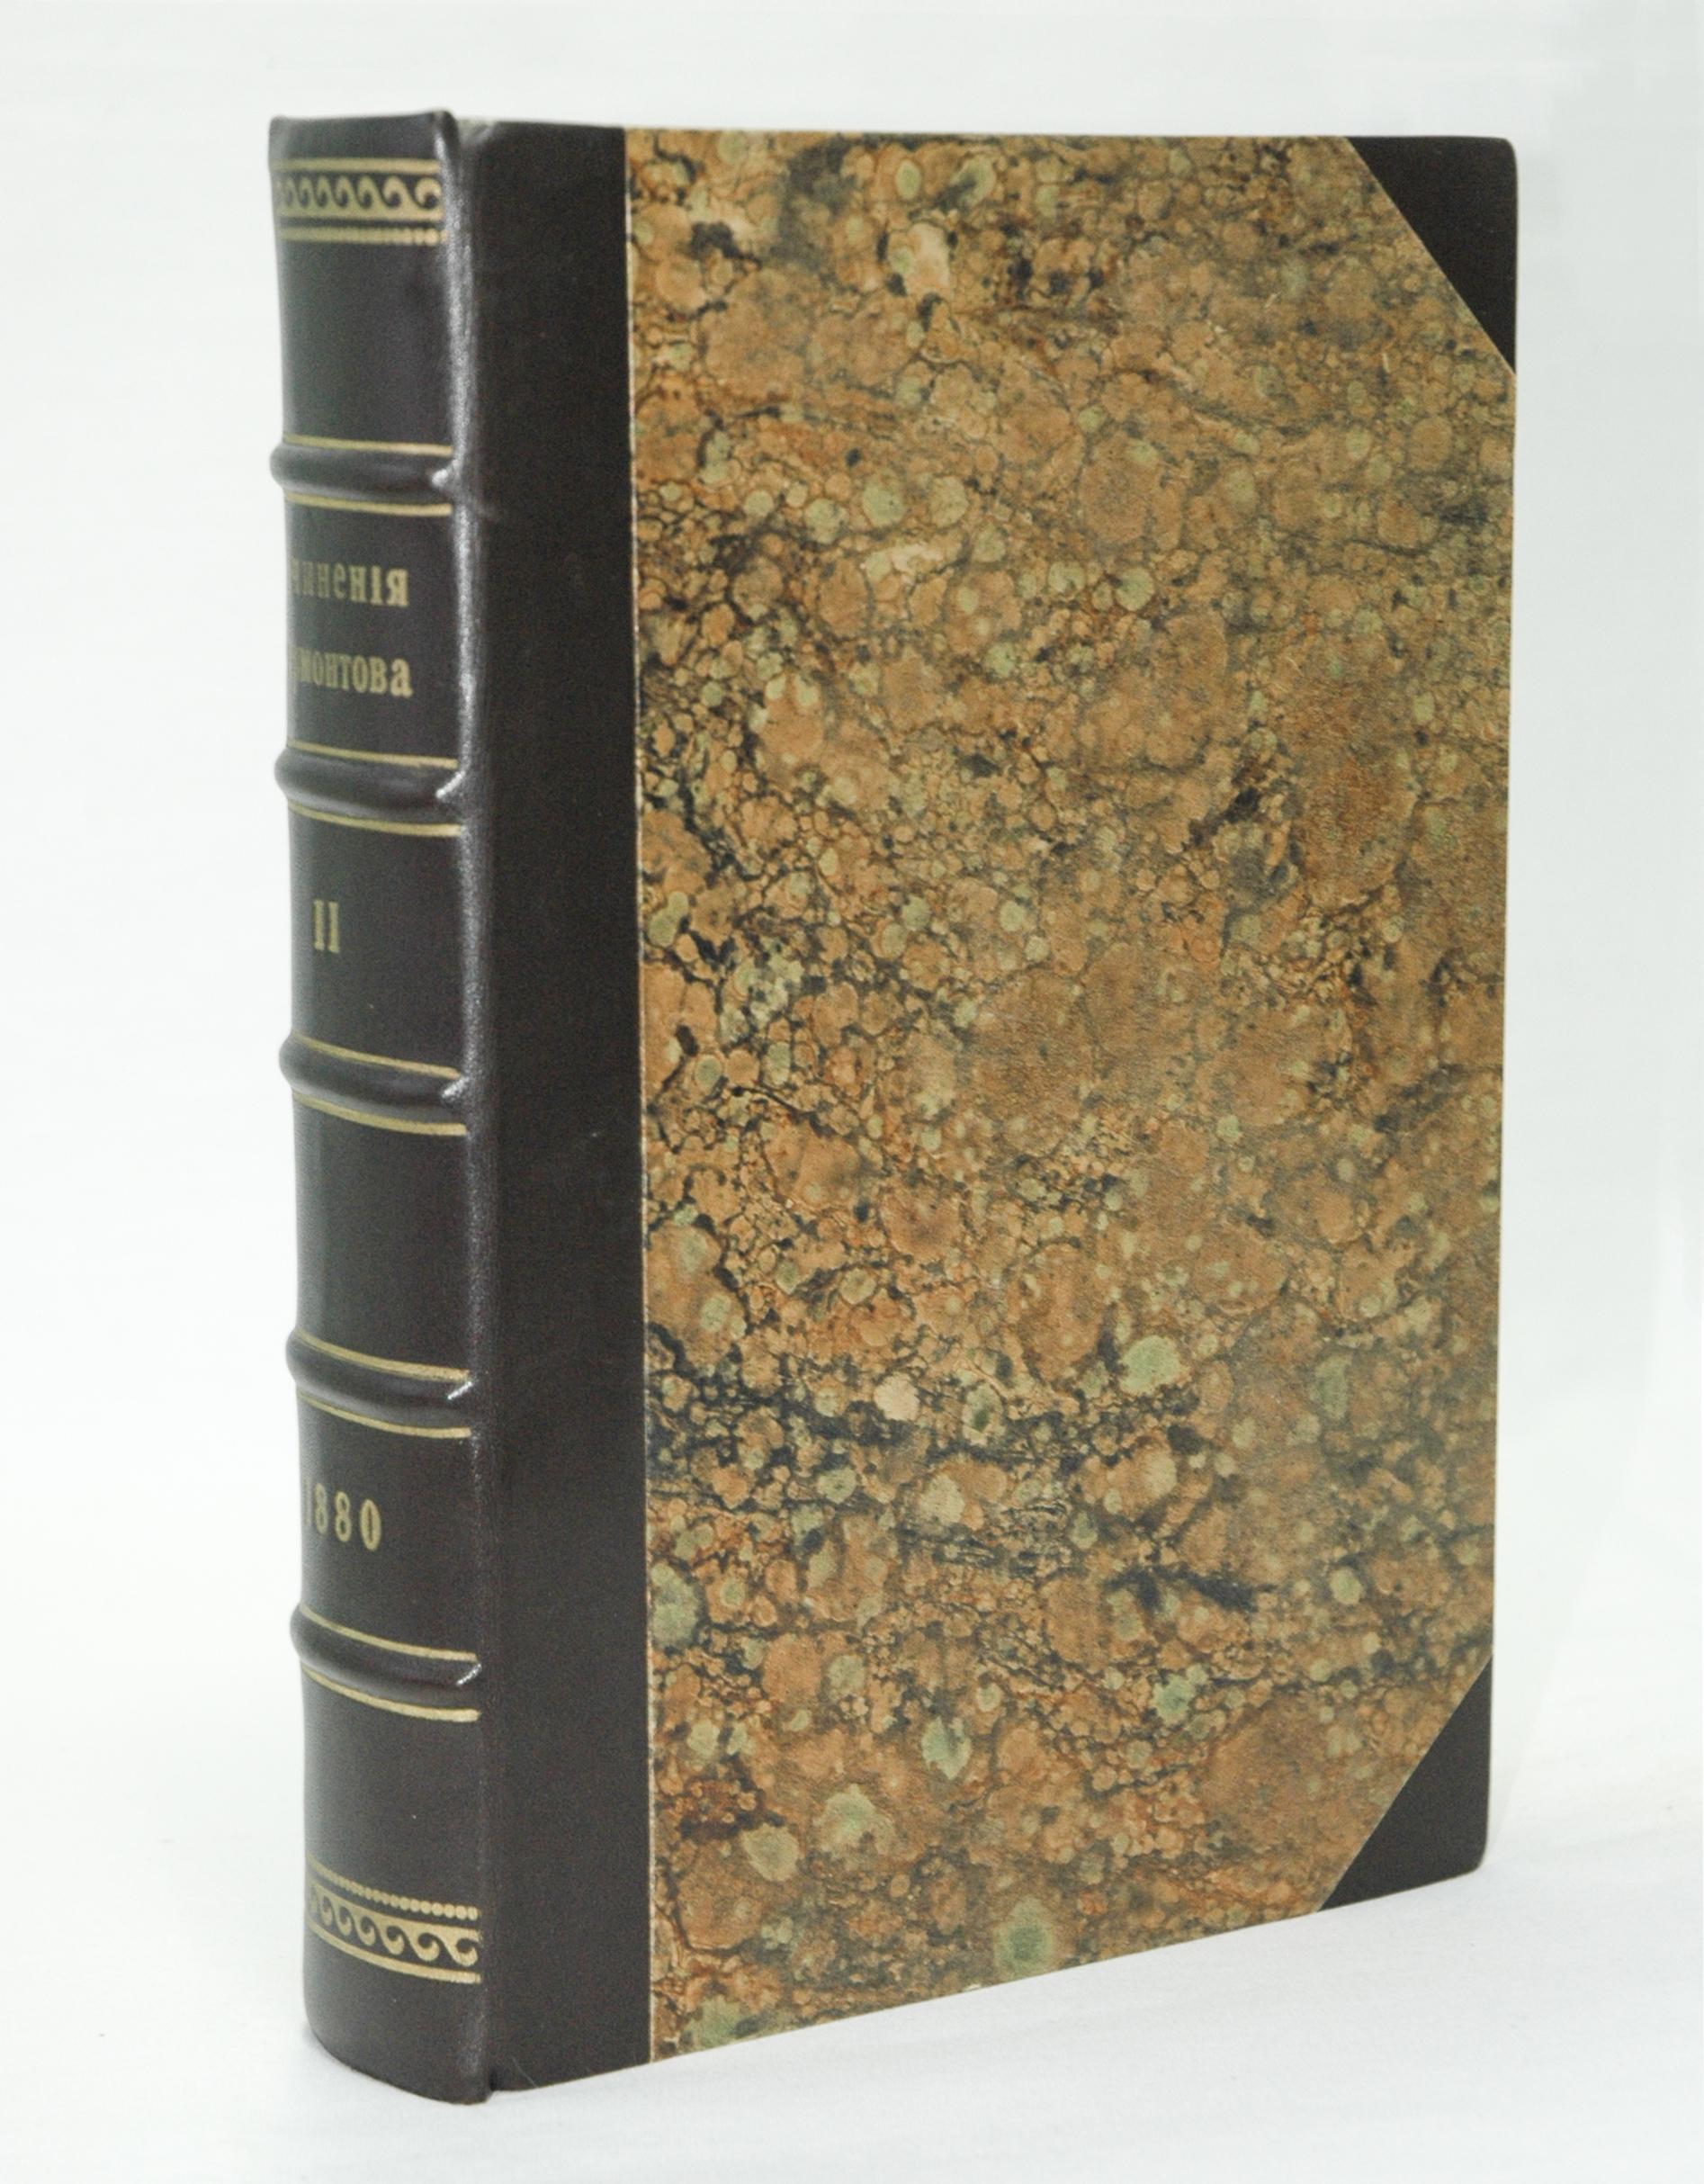 ЛОК-826 ТАРХАНЫ КП-1803 М.Ю.Лермонтов Книга Сочинения. Т. 2._1